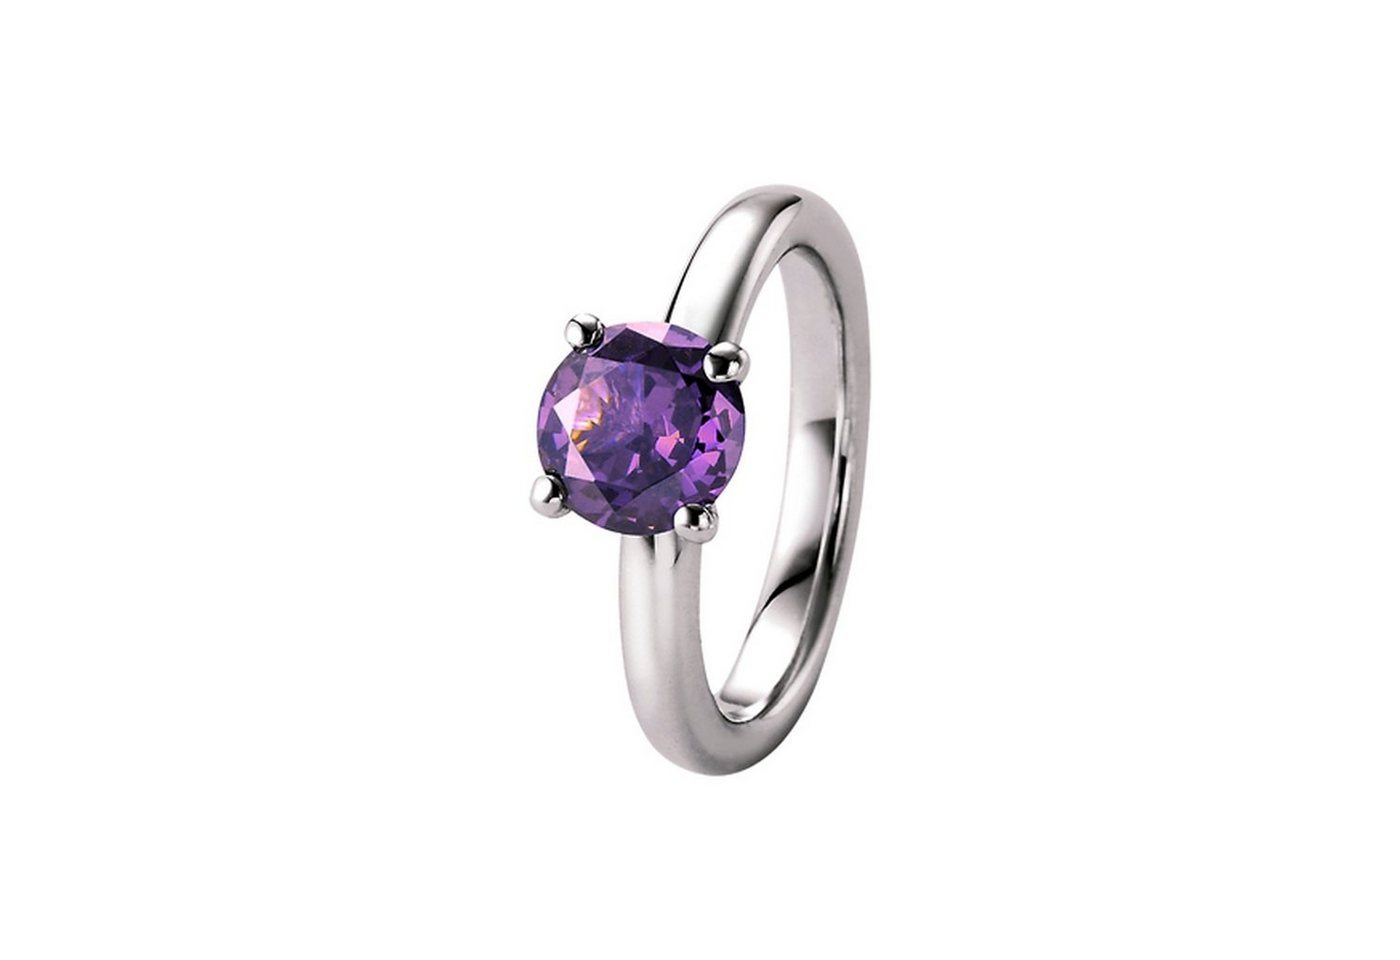 giorgio martello milano -  Fingerring »mit lavendelfarbigem Zirkonia, Silber 925«